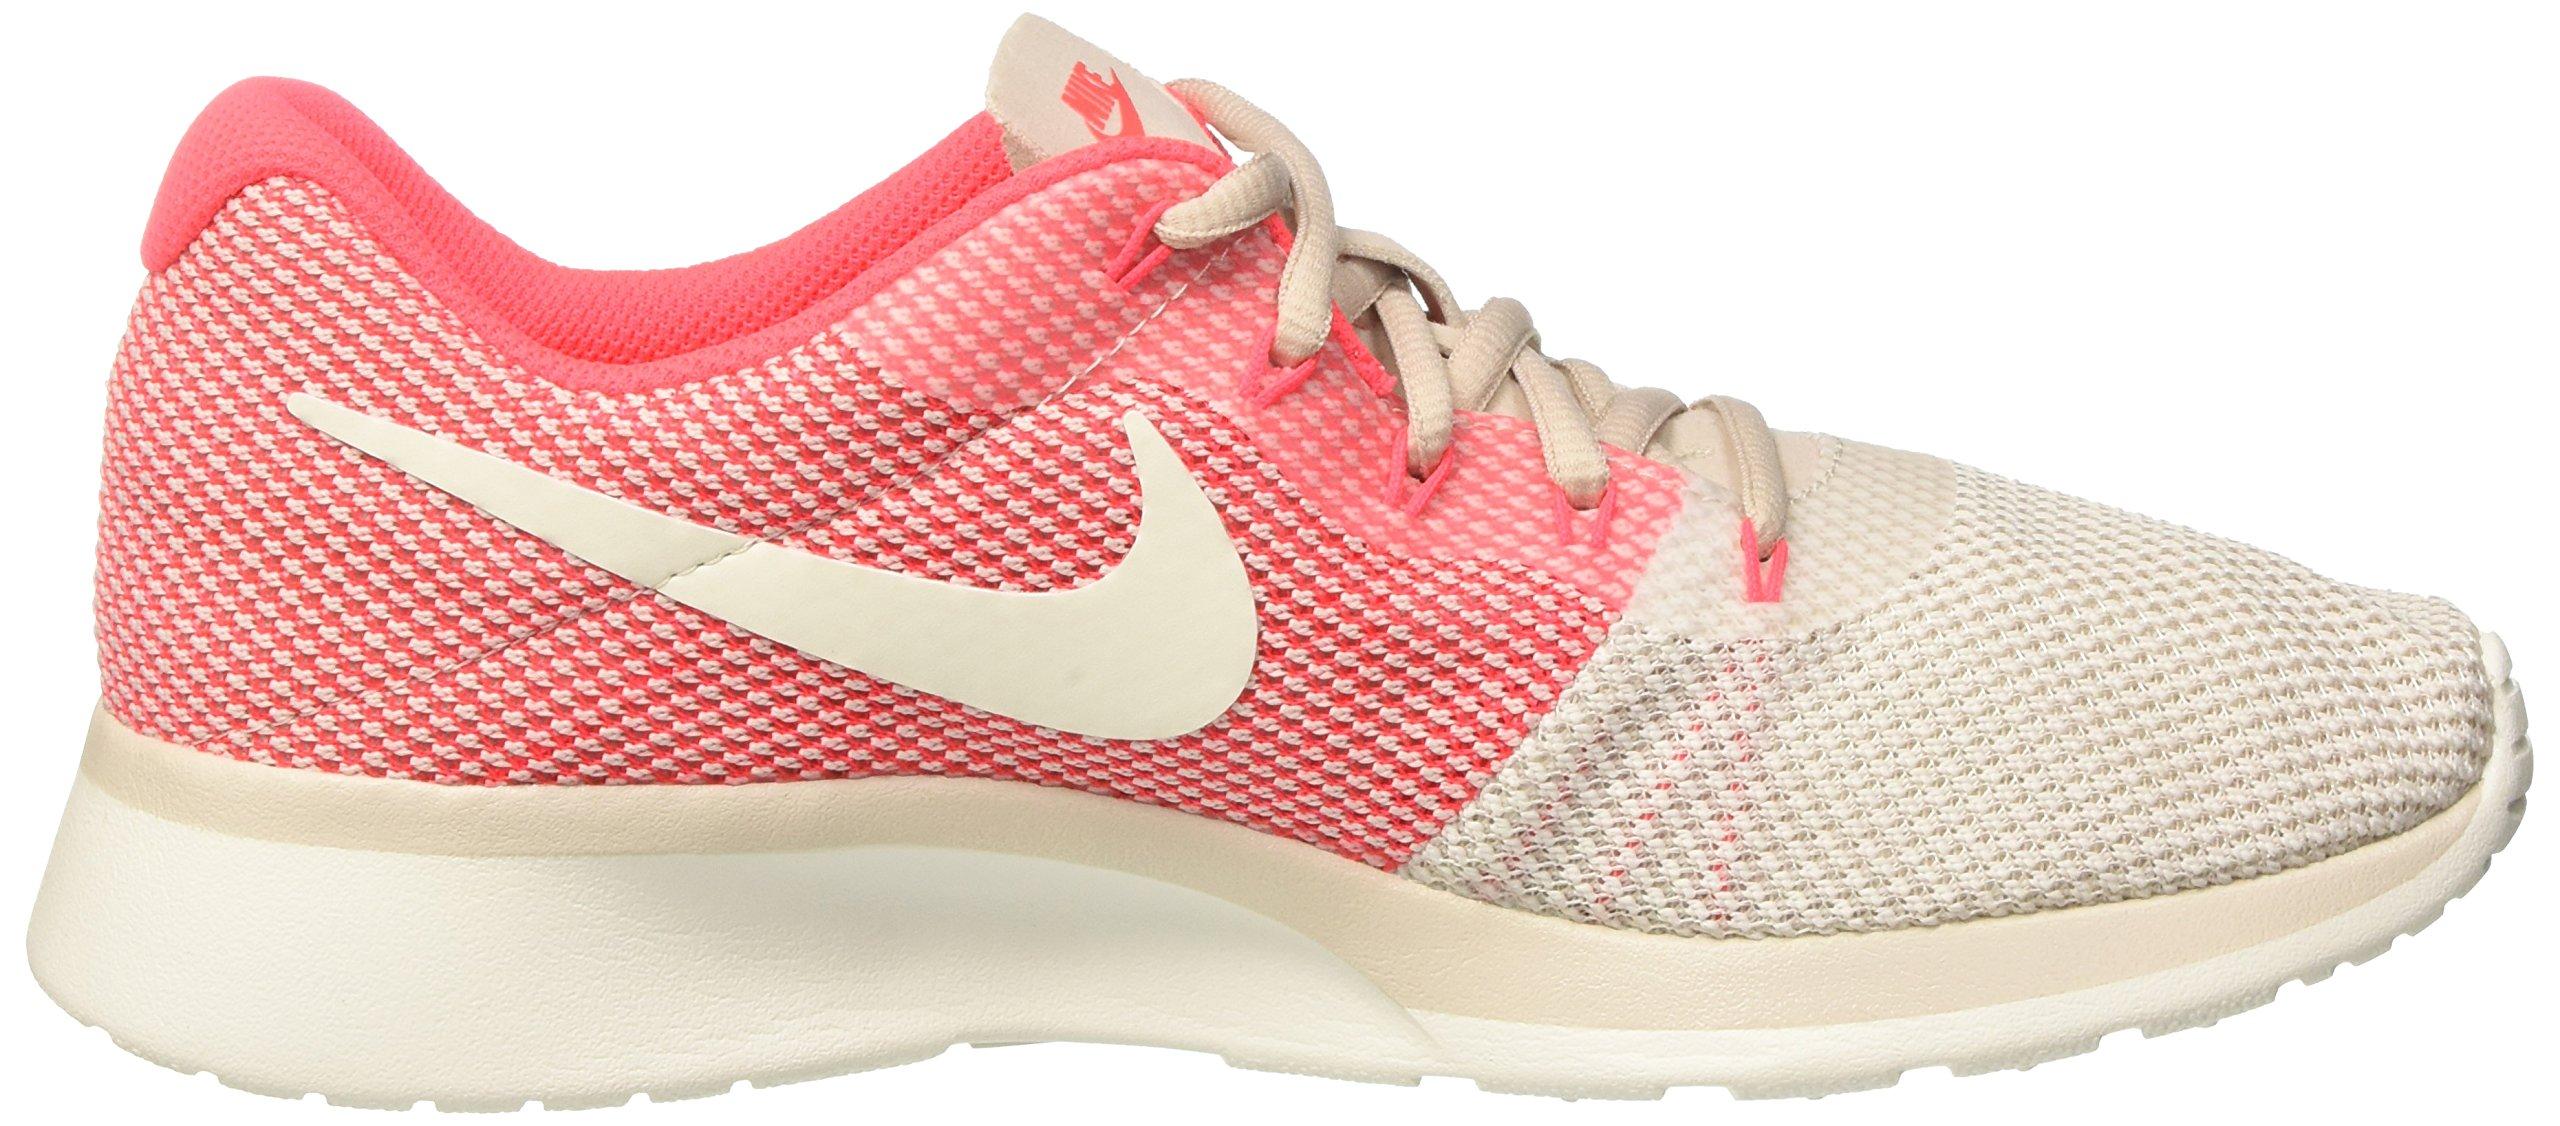 nouveau style et luxe site officiel chaussure Nike WMNS Tanjun Racer, Chaussures de Running Femme